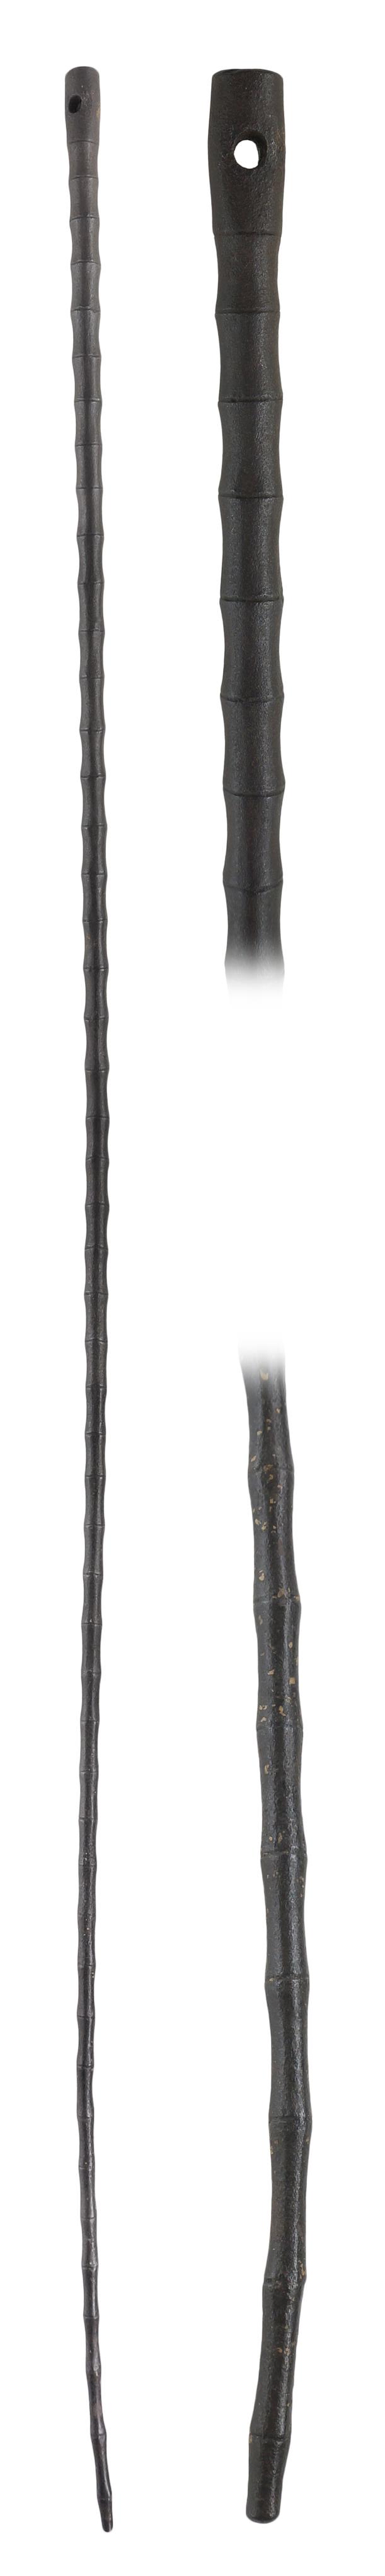 japanese kanamuchi iron whip edo period 110 cm inch armas armas caseras armas. Black Bedroom Furniture Sets. Home Design Ideas